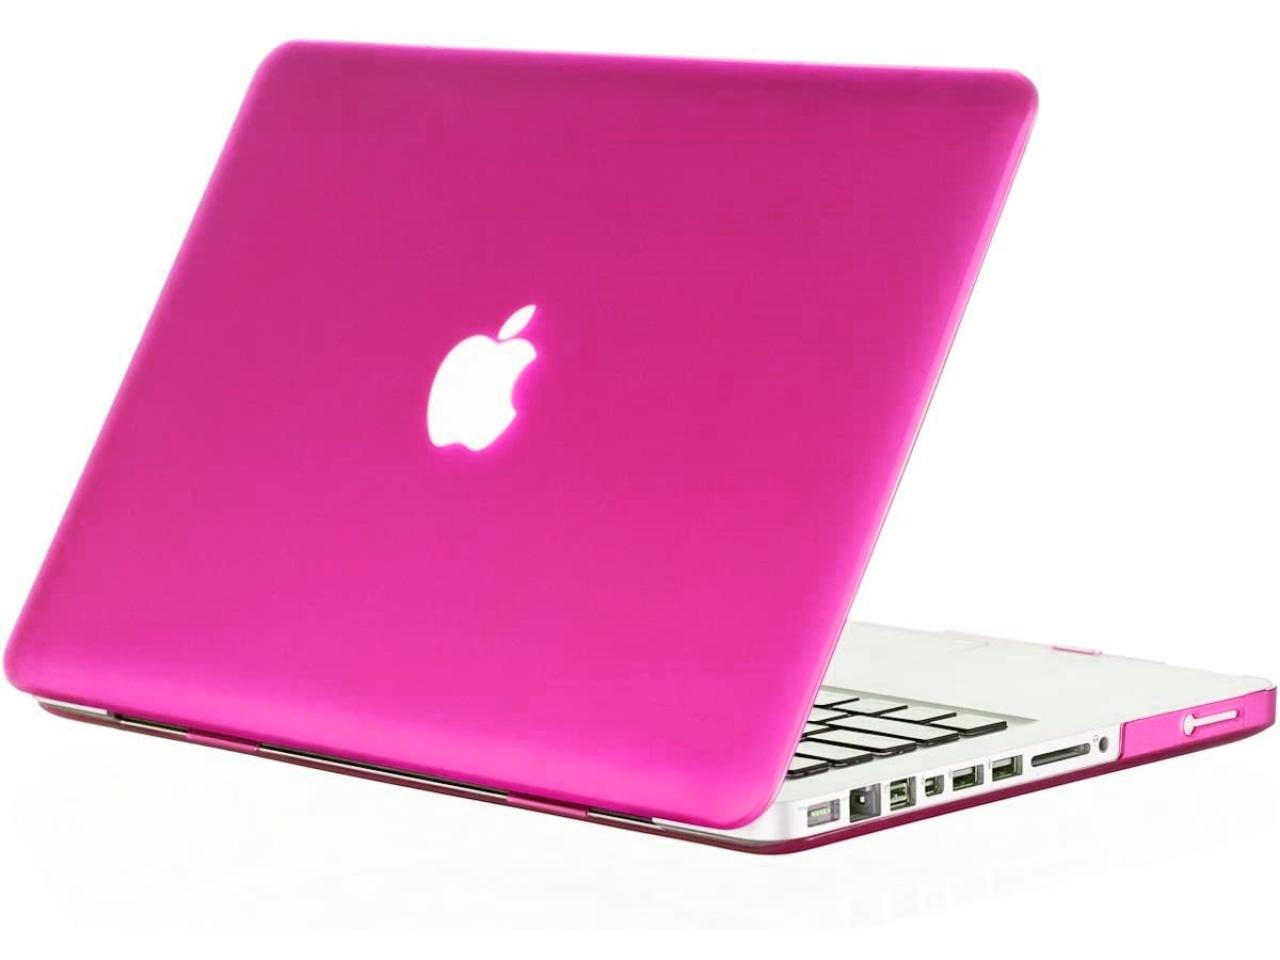 macbook pro 13 schutzh lle pink matt case smartshell. Black Bedroom Furniture Sets. Home Design Ideas